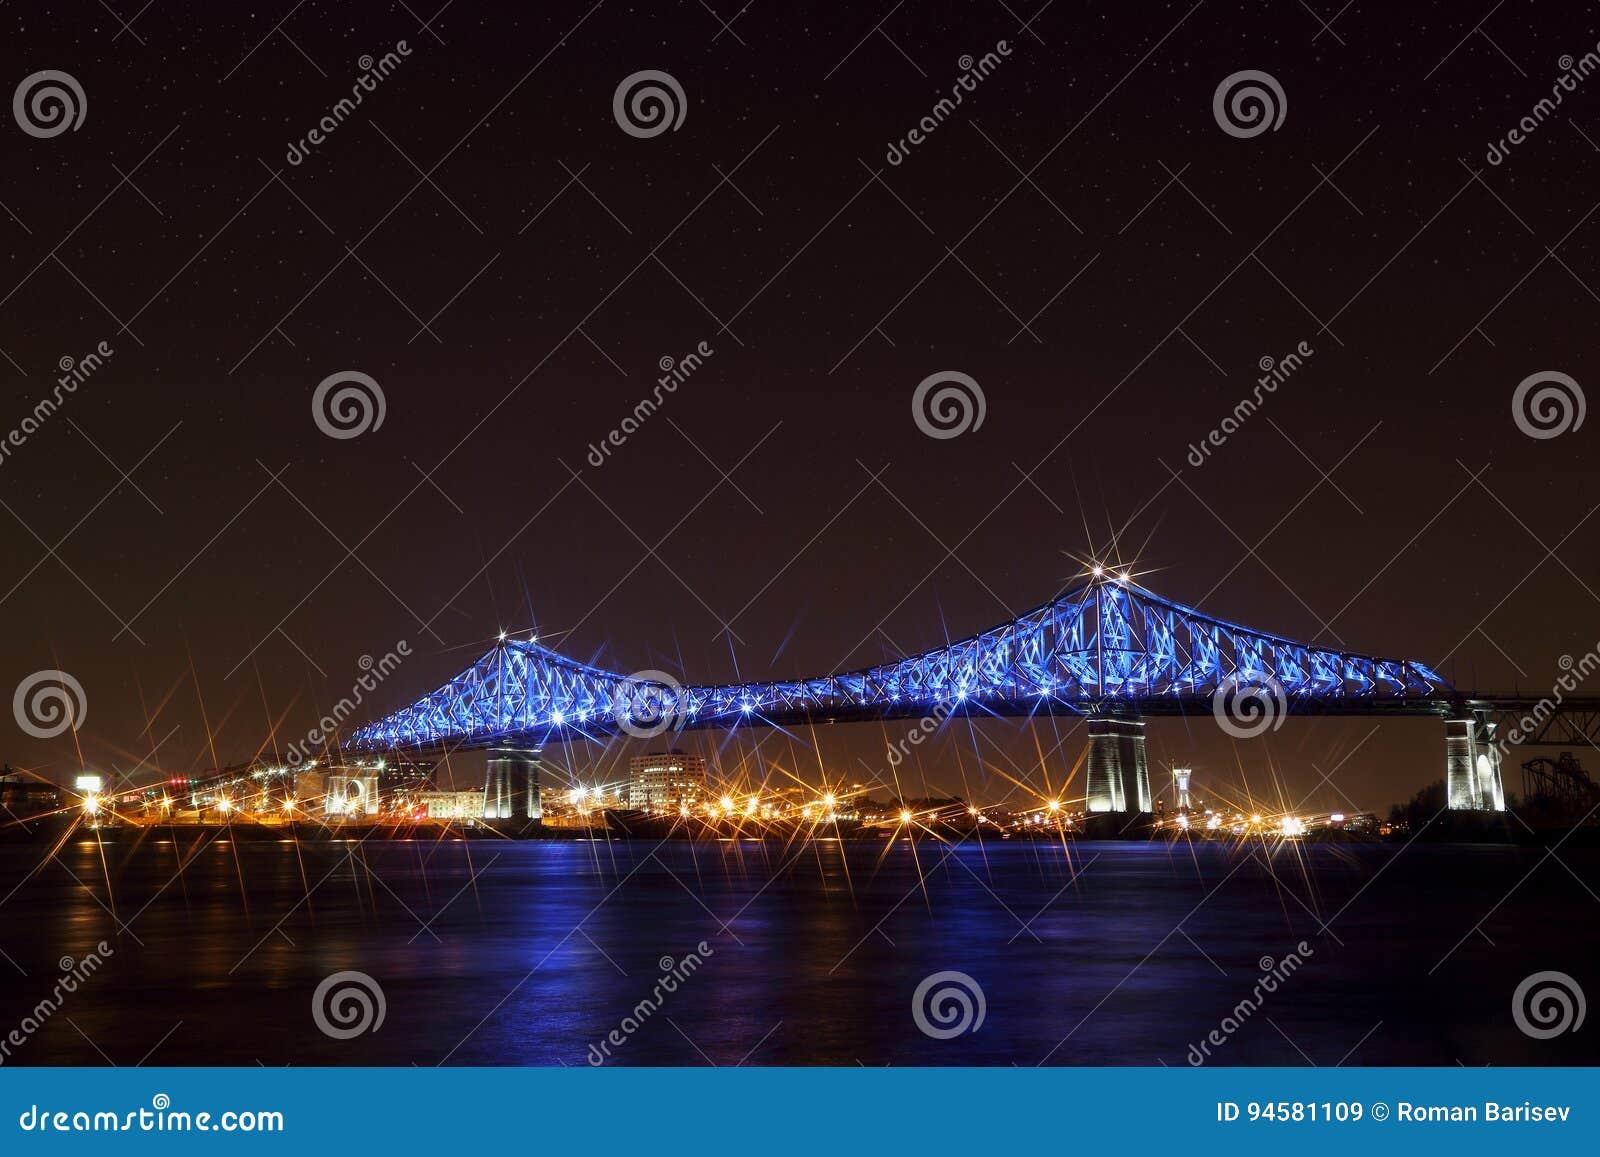 Jacques Cartier Bridge Illumination em Montreal Aniversário de Montreal's 375th interativo colorido luminoso